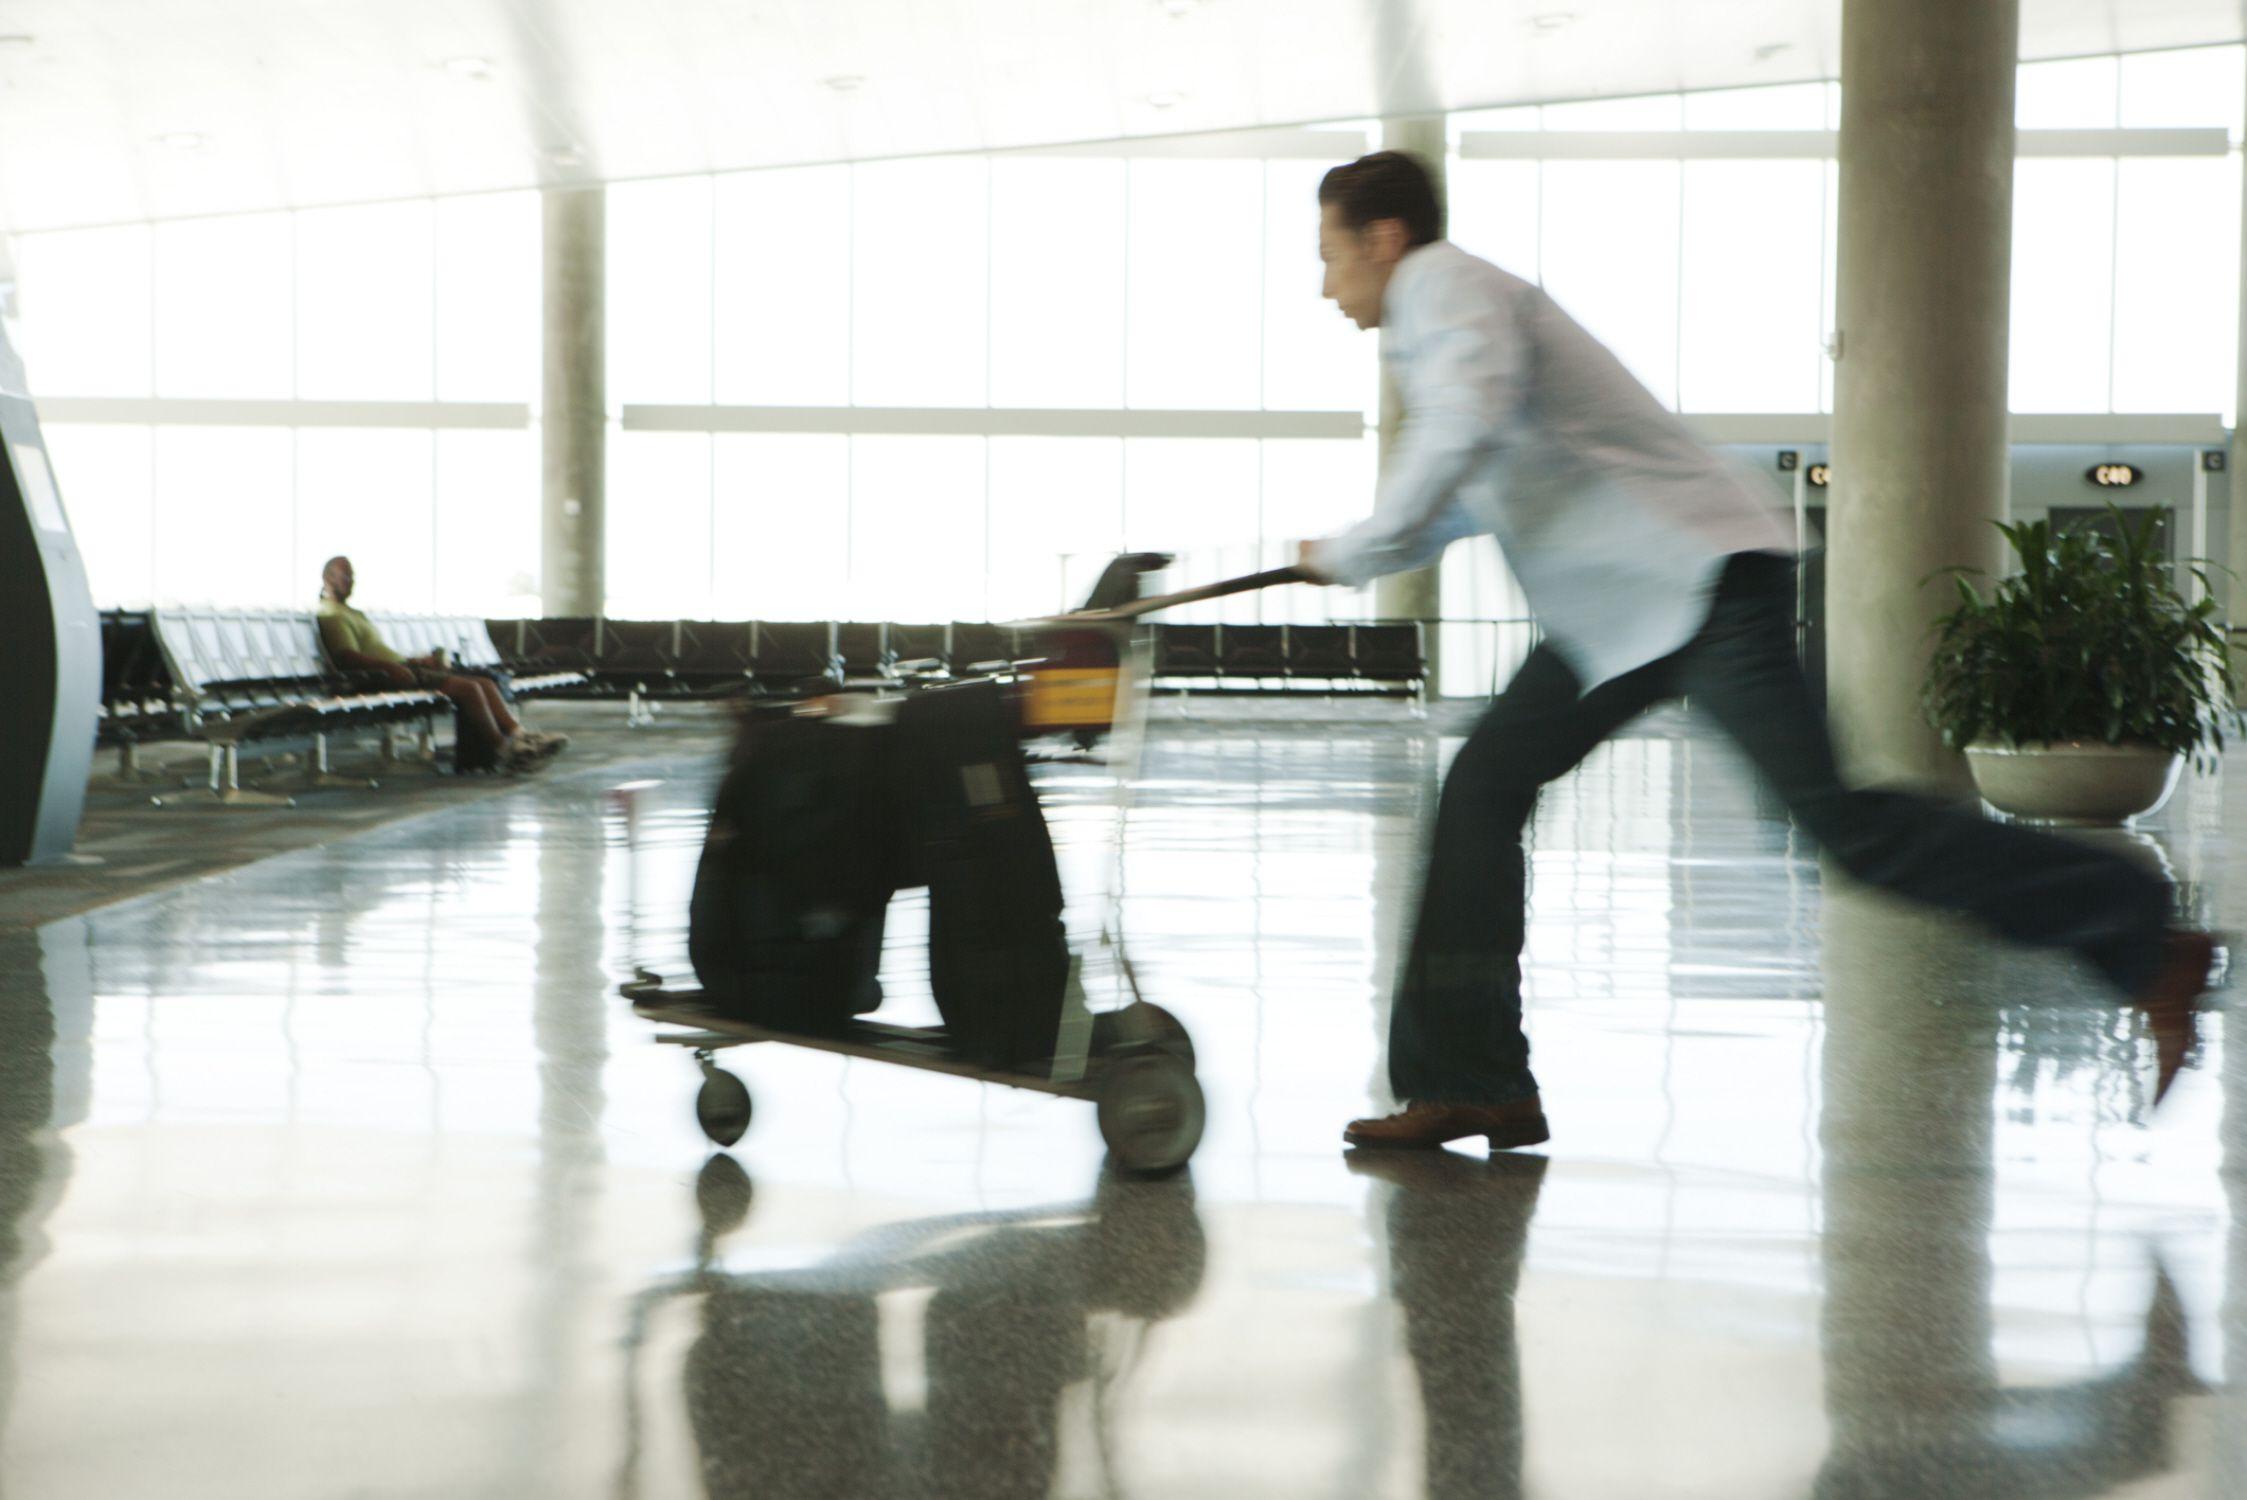 Do I Need Travel Insurance For Domestic Travel In Australia